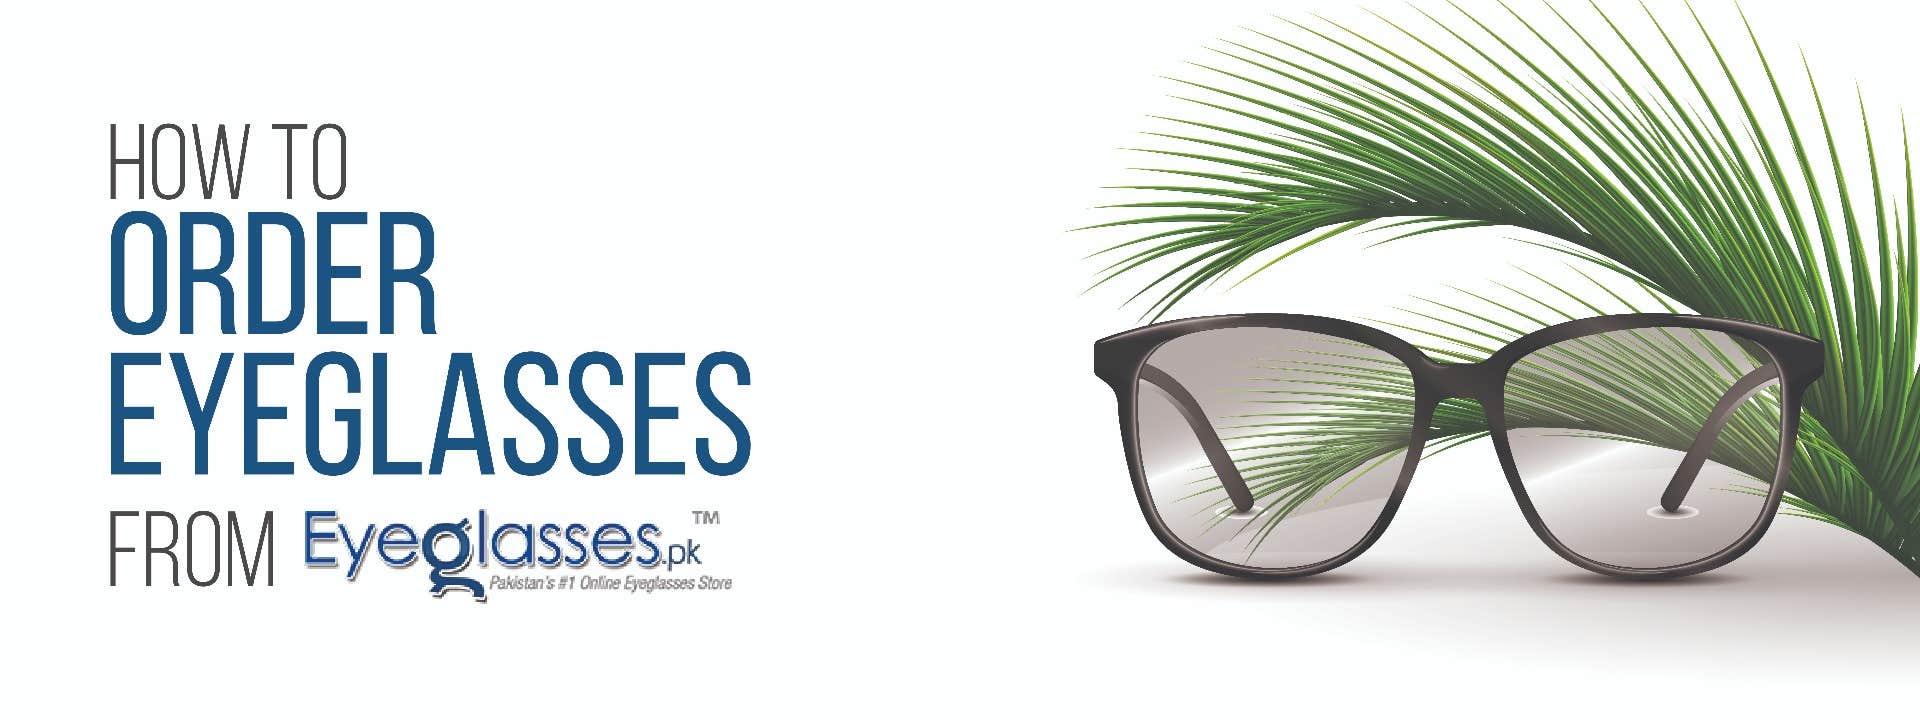 How to Order Your Eyeglasses at Eyeglasses PK